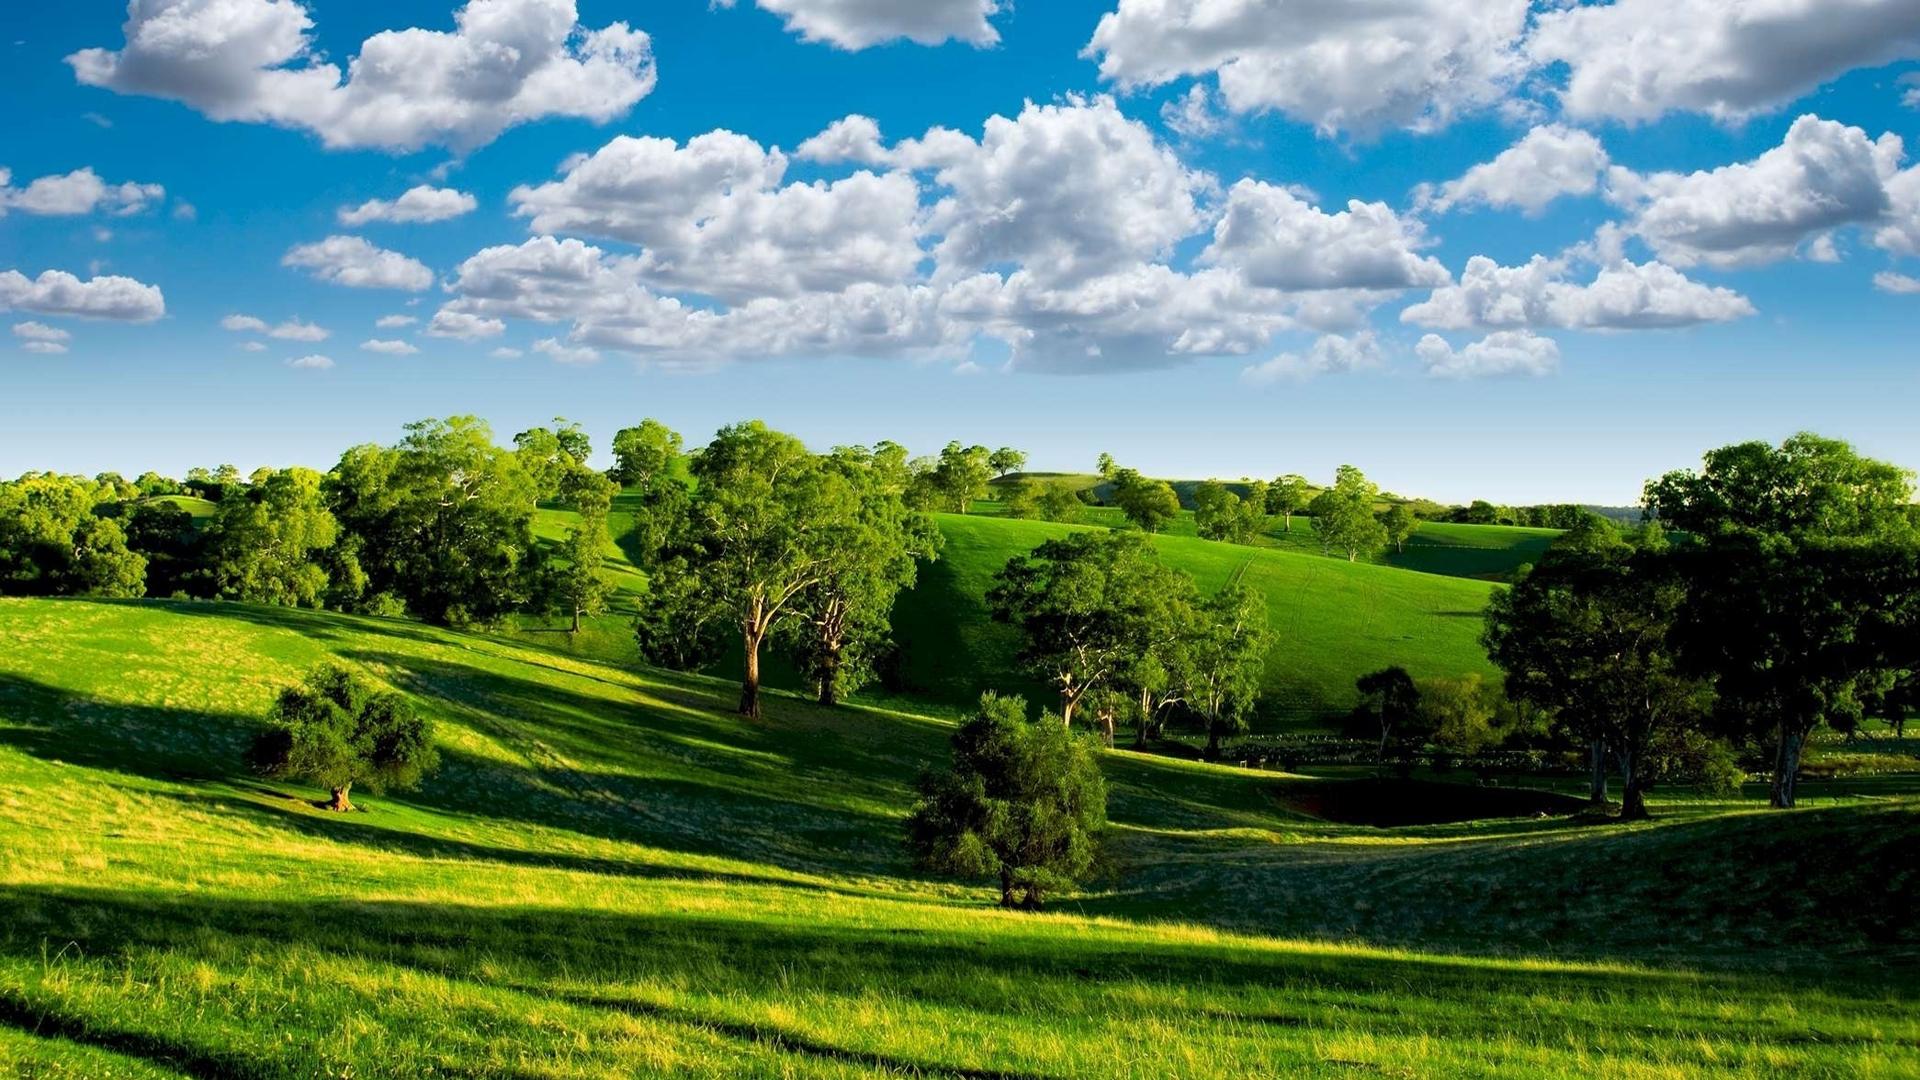 природа трава поле небо облака деревья nature grass field the sky clouds trees без смс